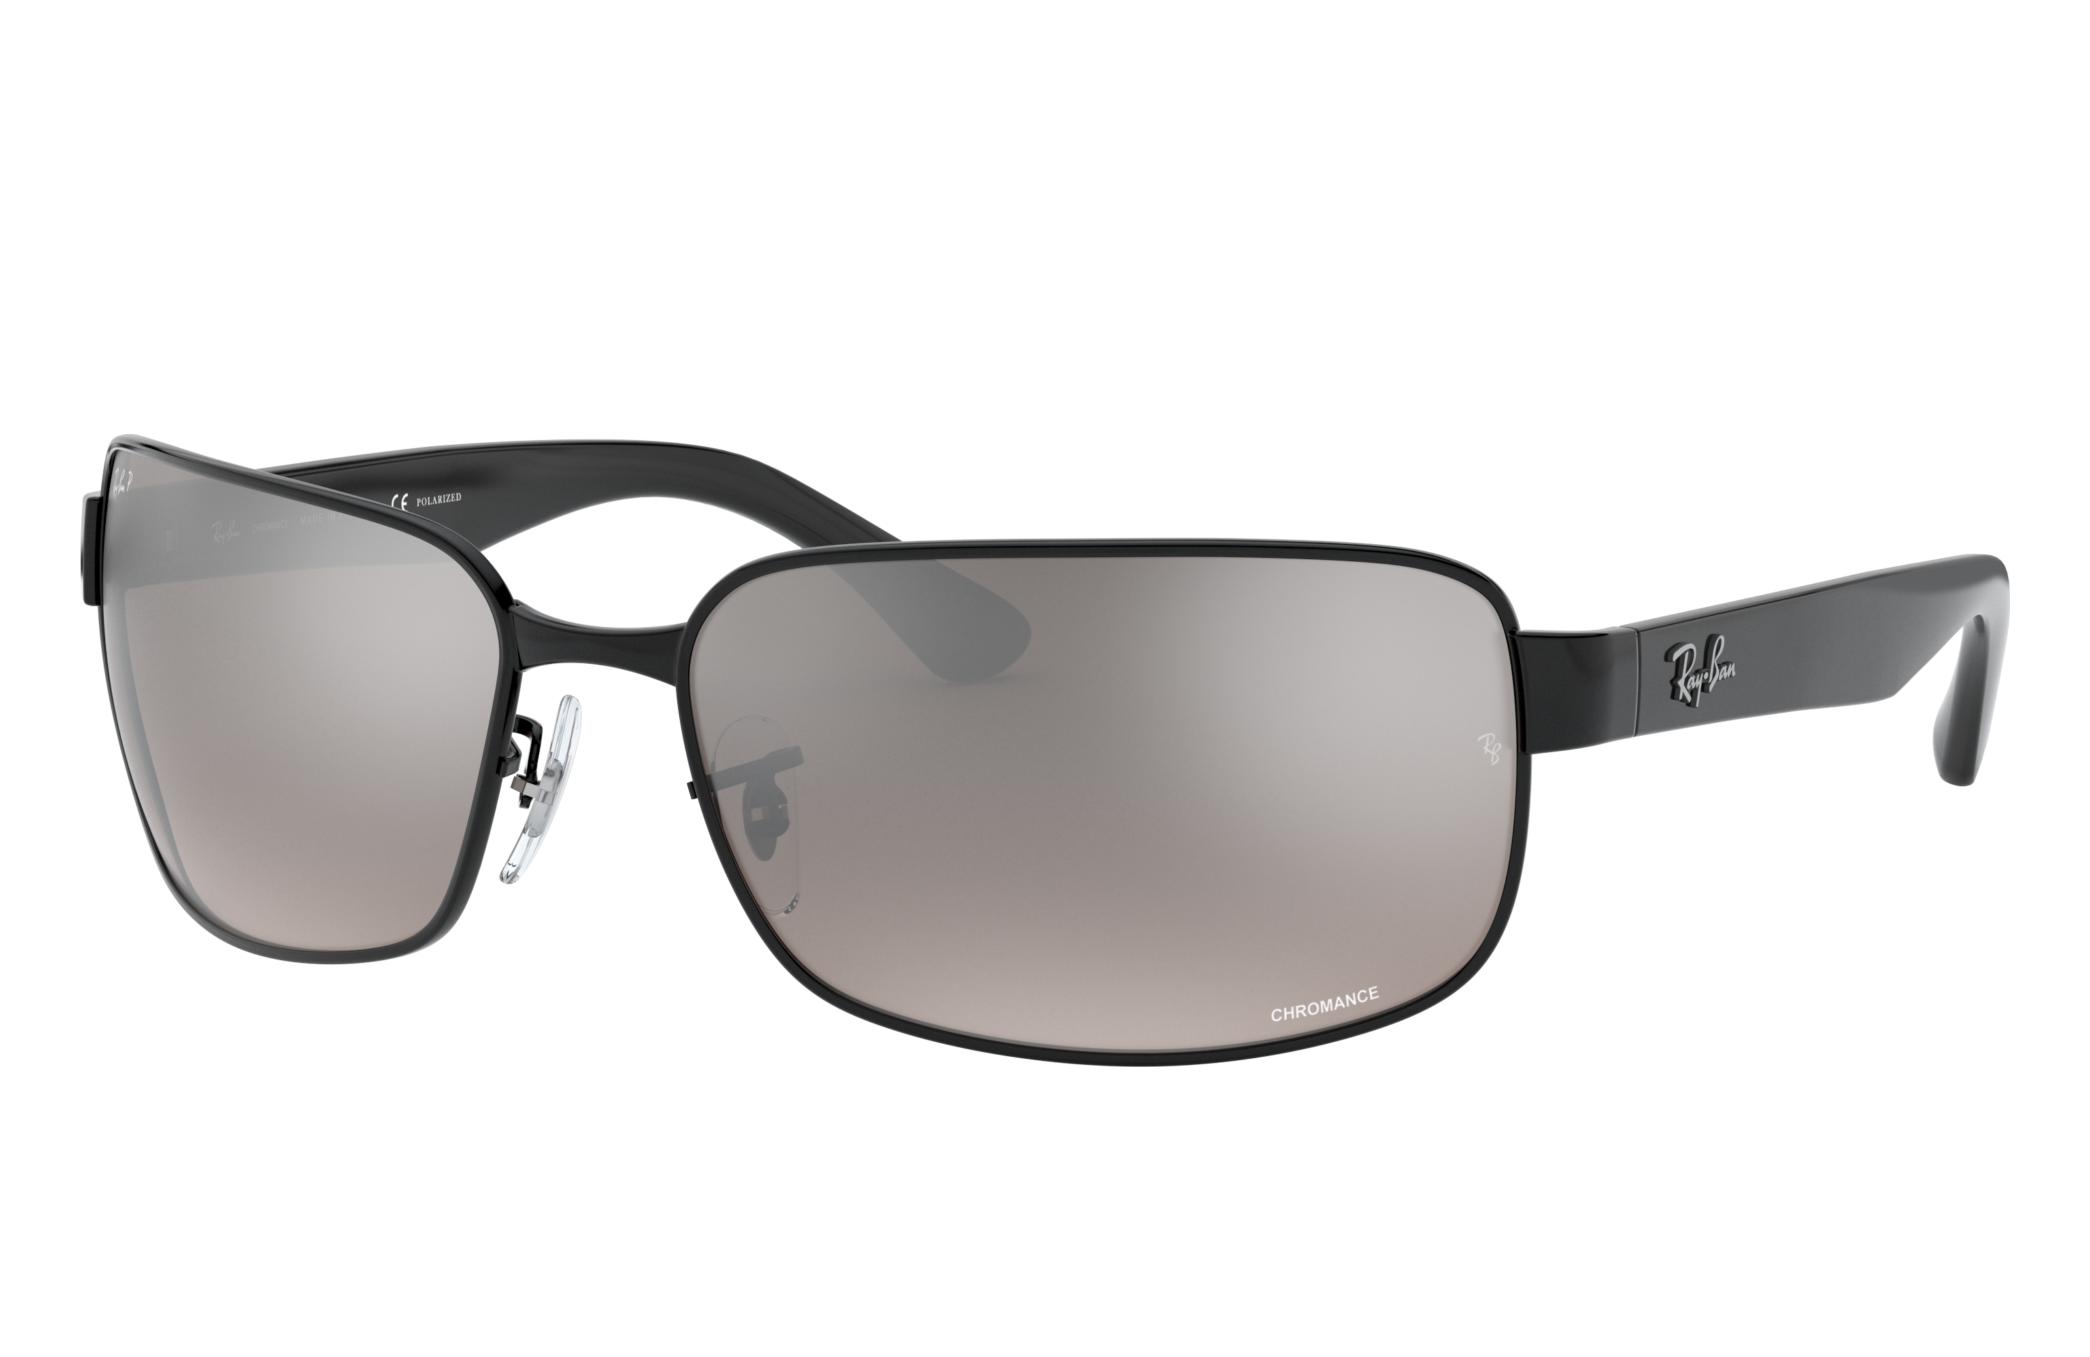 Ray-Ban Rb3566 Chromance Black, Polarized Gray Lenses - RB3566CH